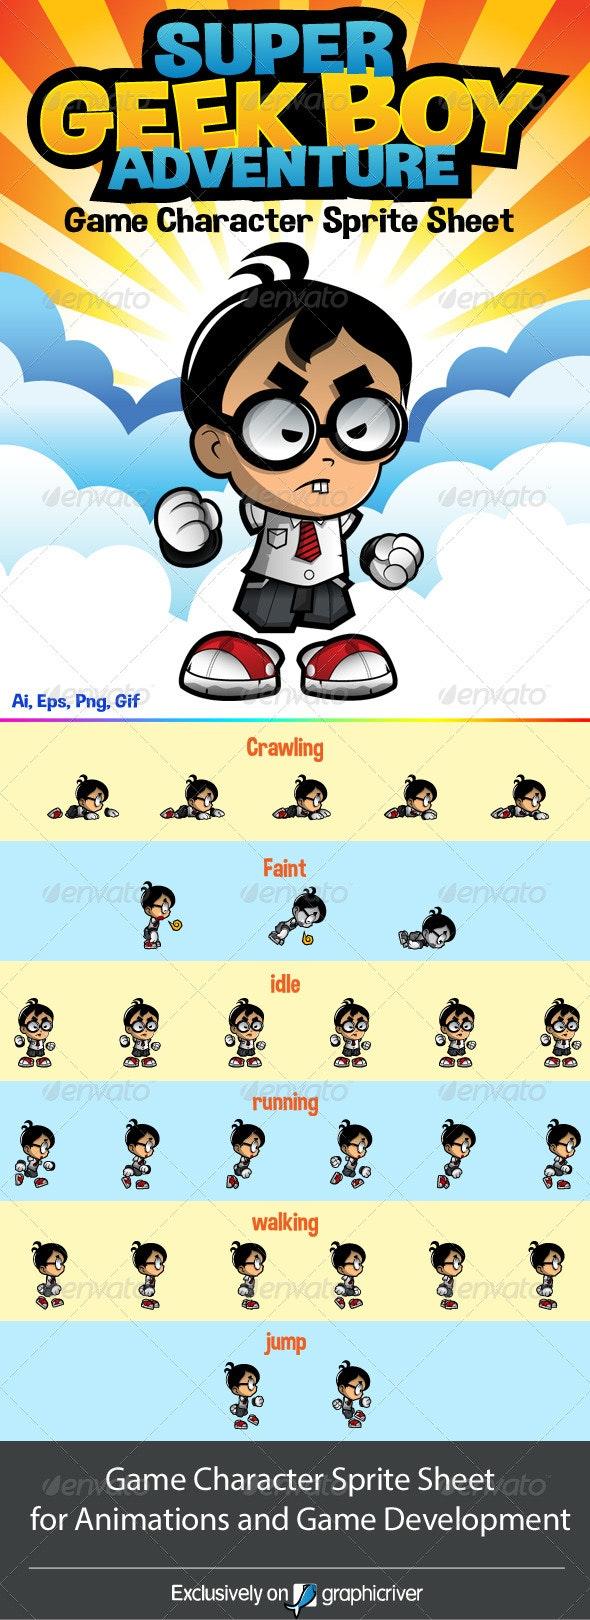 Side Scrolling Game Character: Geek Boy Adventure - Sprites Game Assets